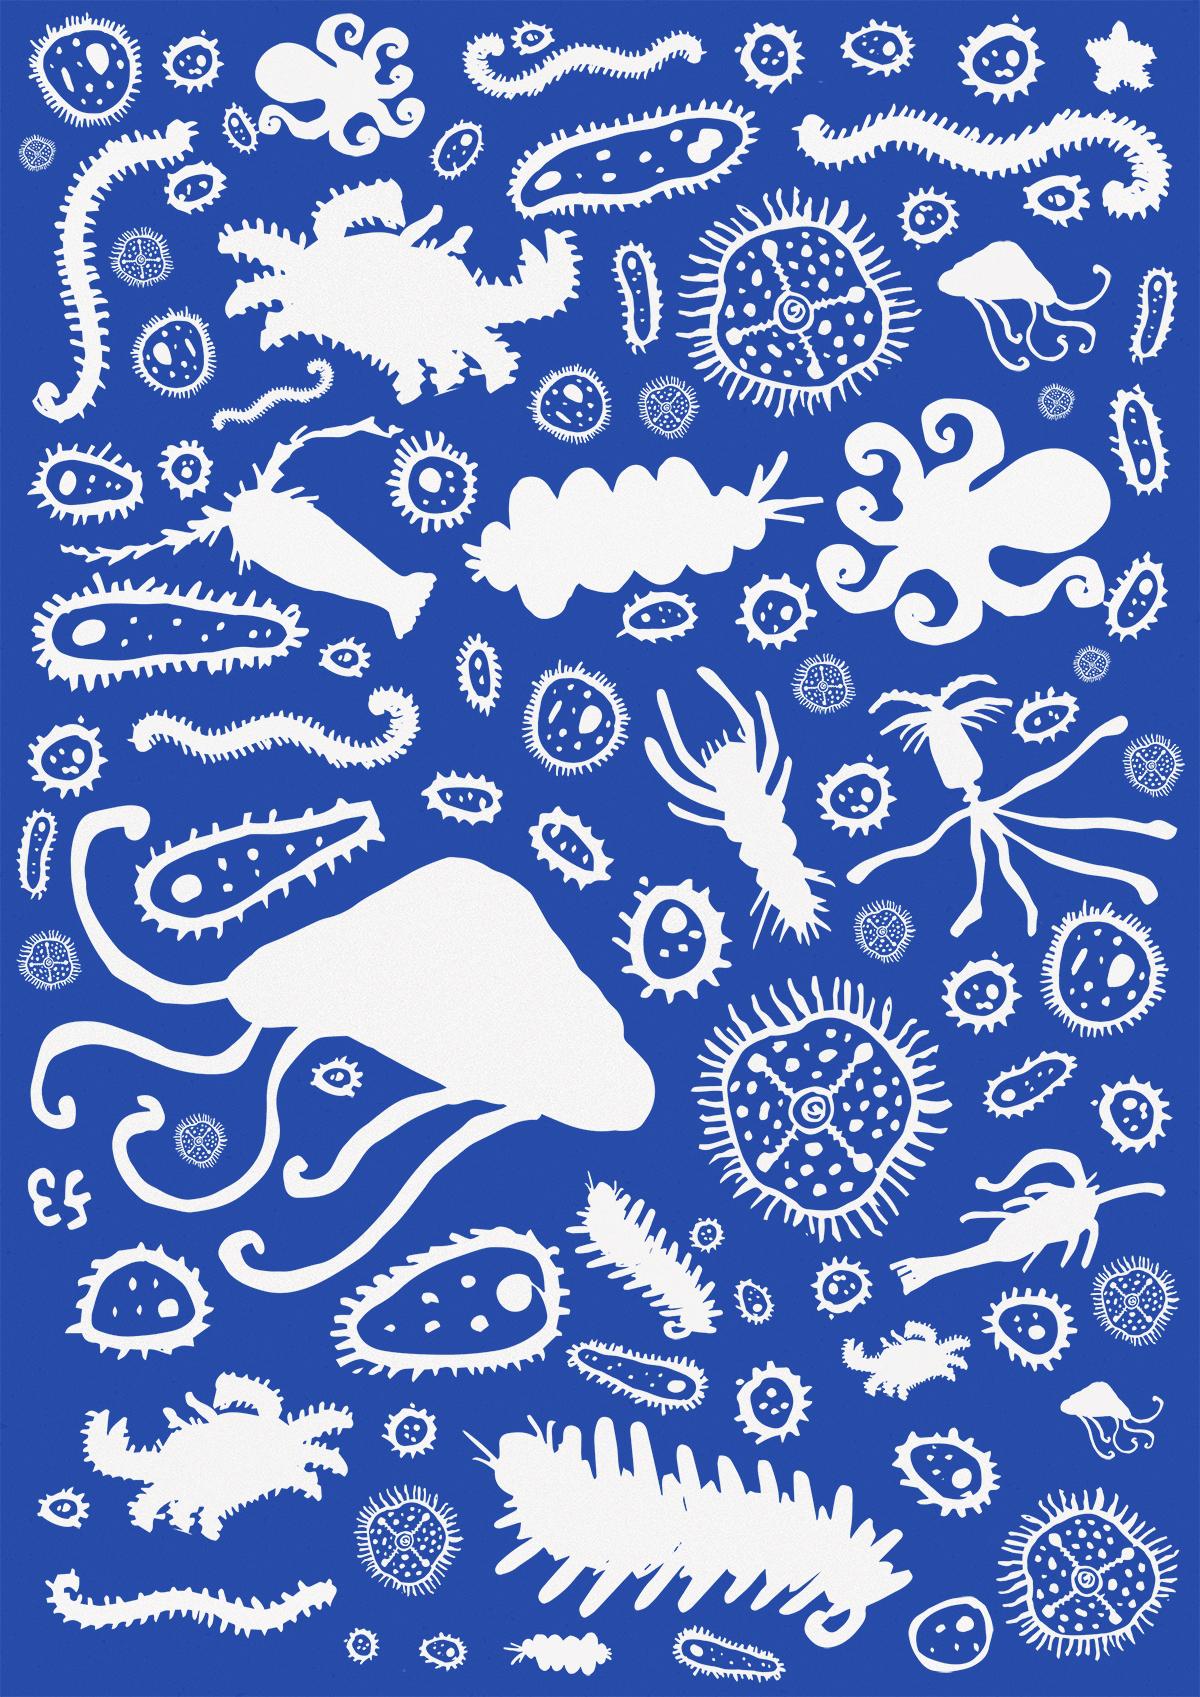 plankton illustration